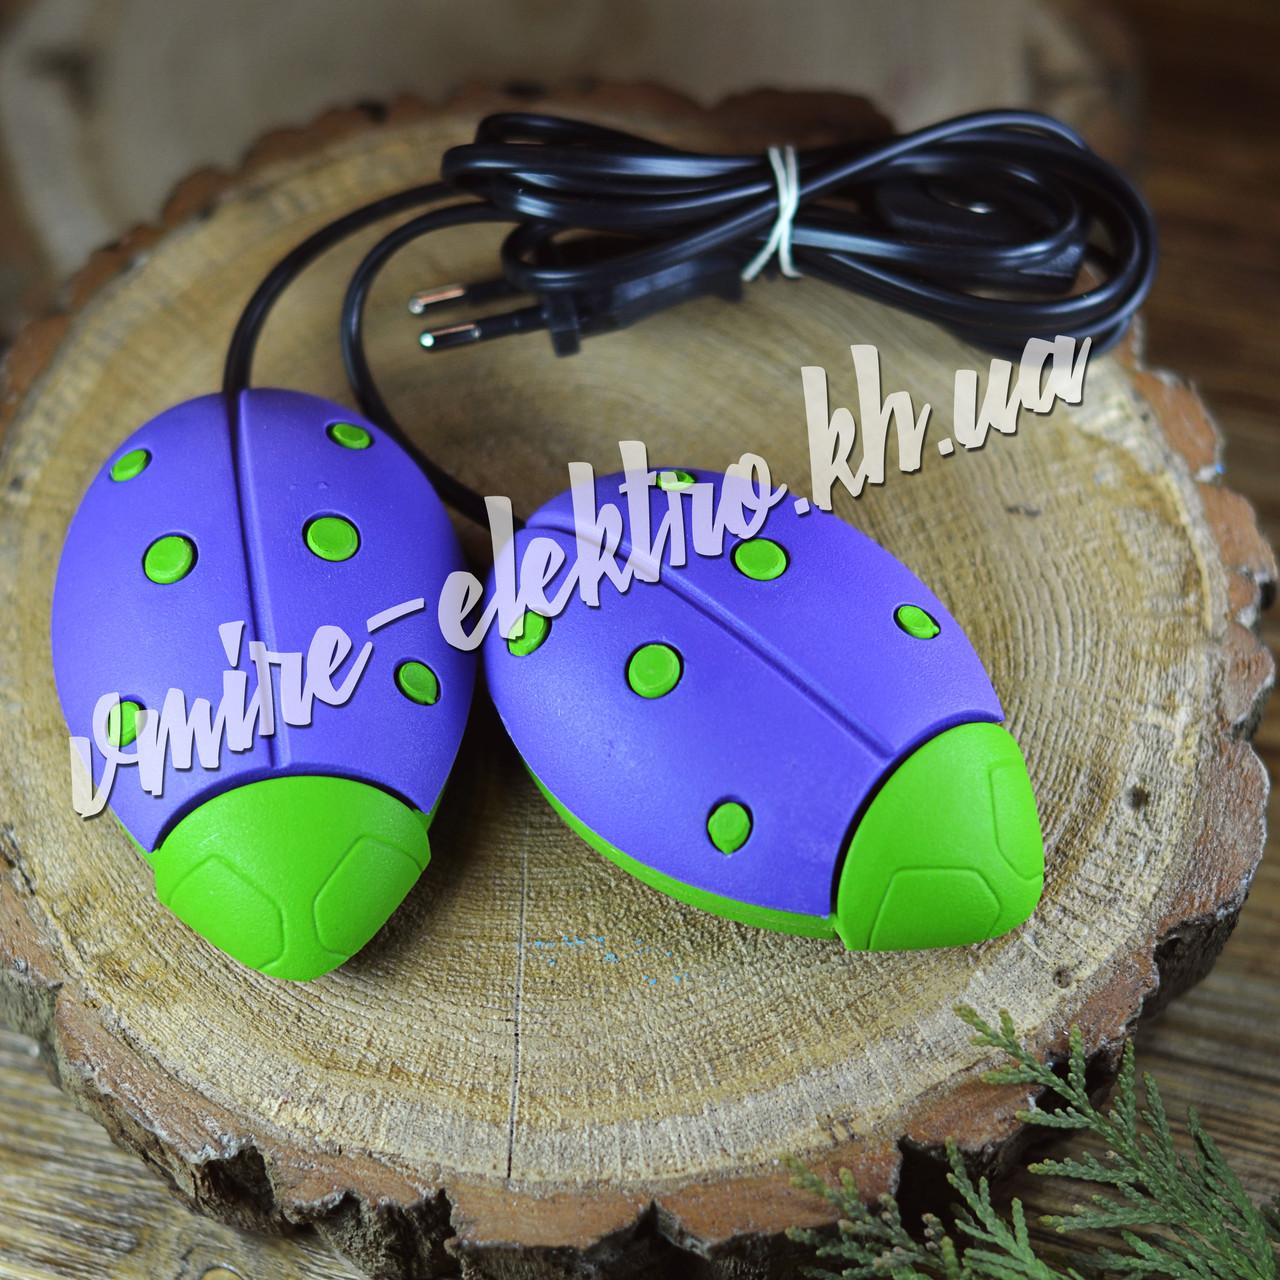 Сушарка для взуття Сонечко фіолетова з зеленими точками